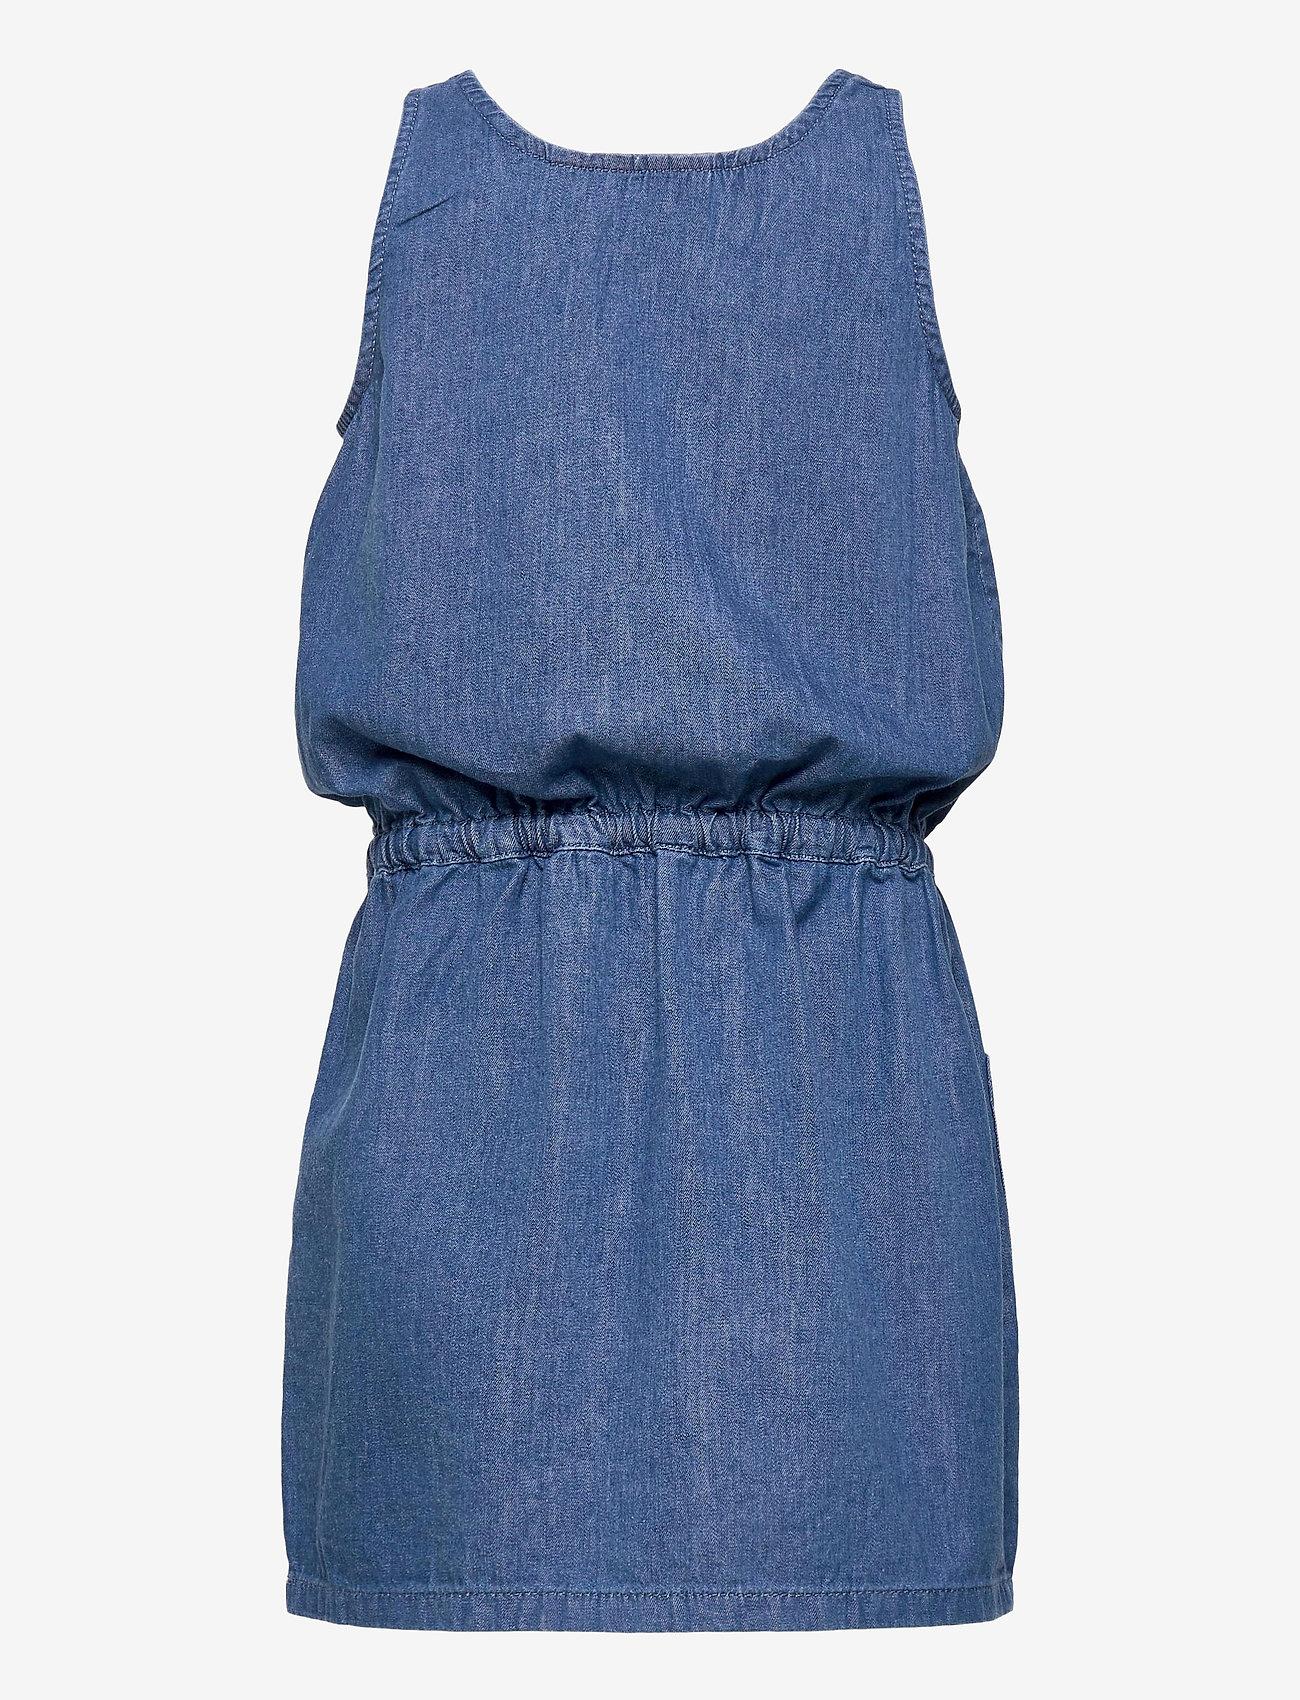 Soft Gallery - Darla Dress - kleider - denim blue - 1